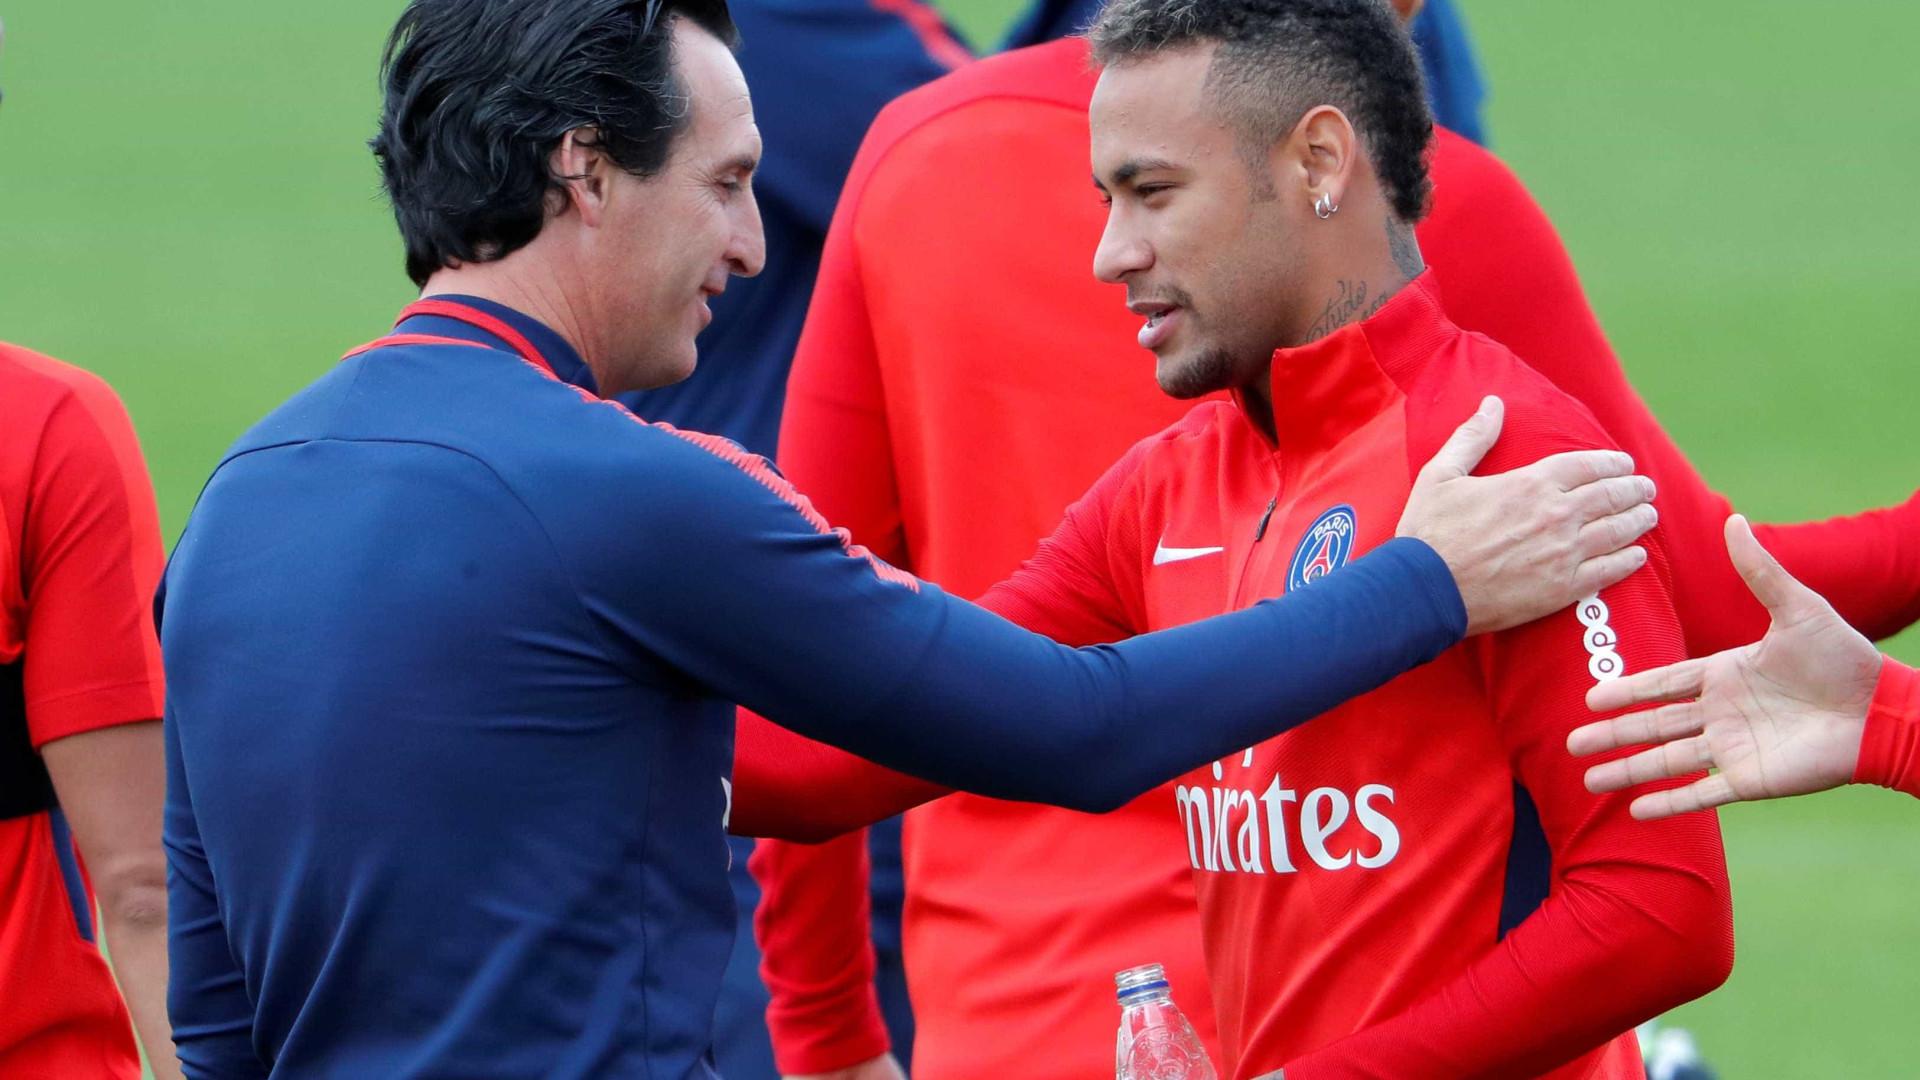 Futuro de Neymar passa pelo PSG, assegura Unai Emery